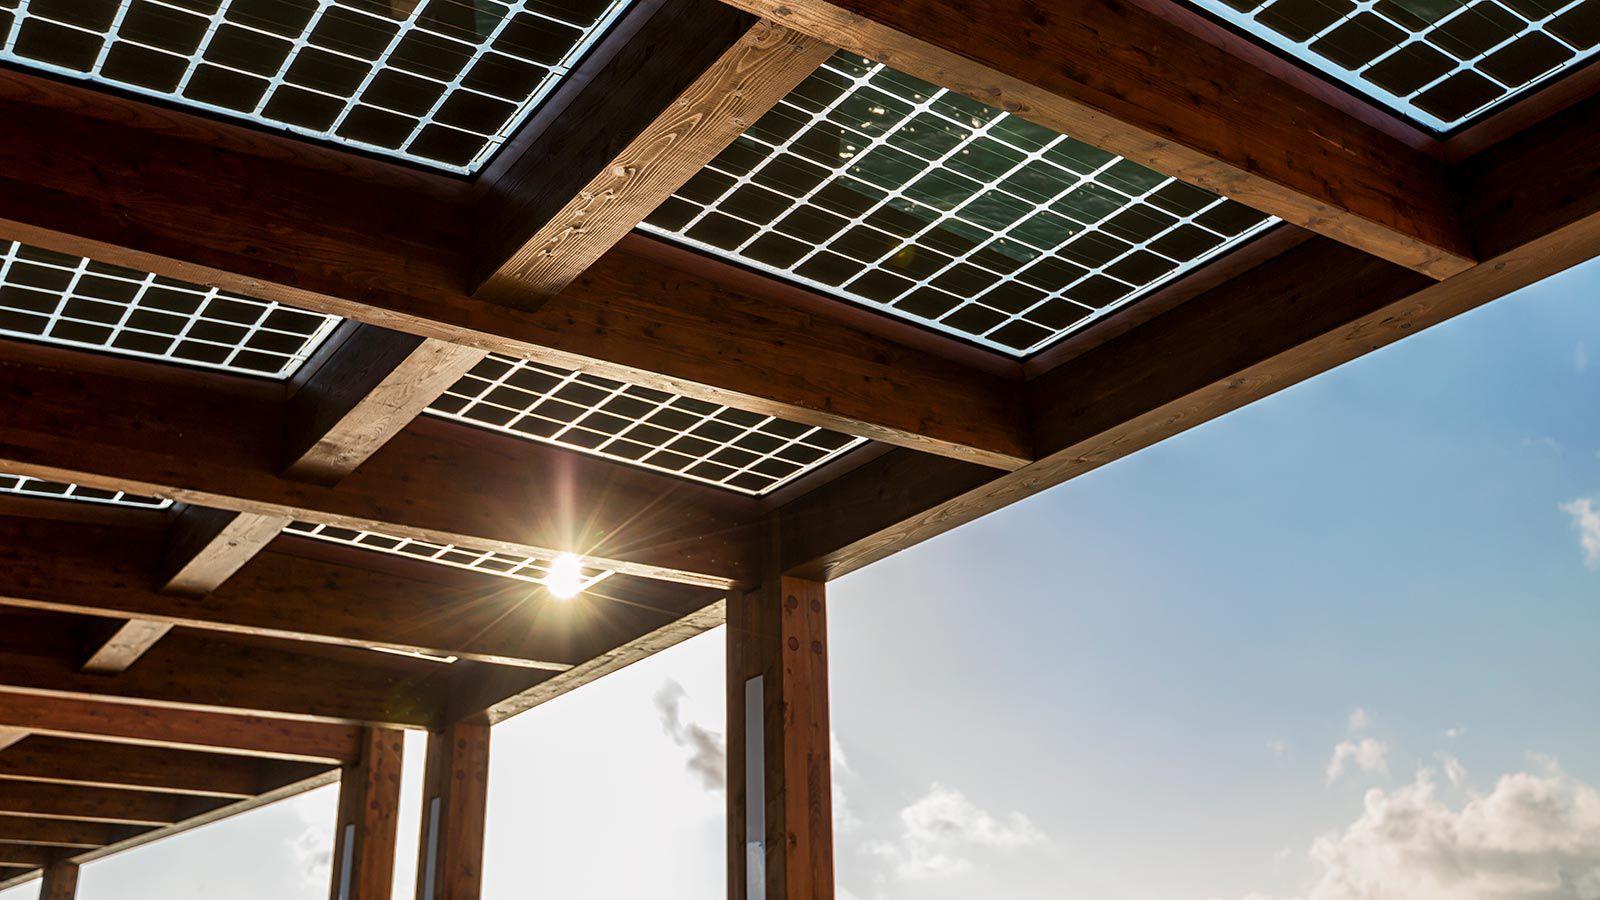 Solar panels installed at the Hurawalhi Island Resort in the Maldives